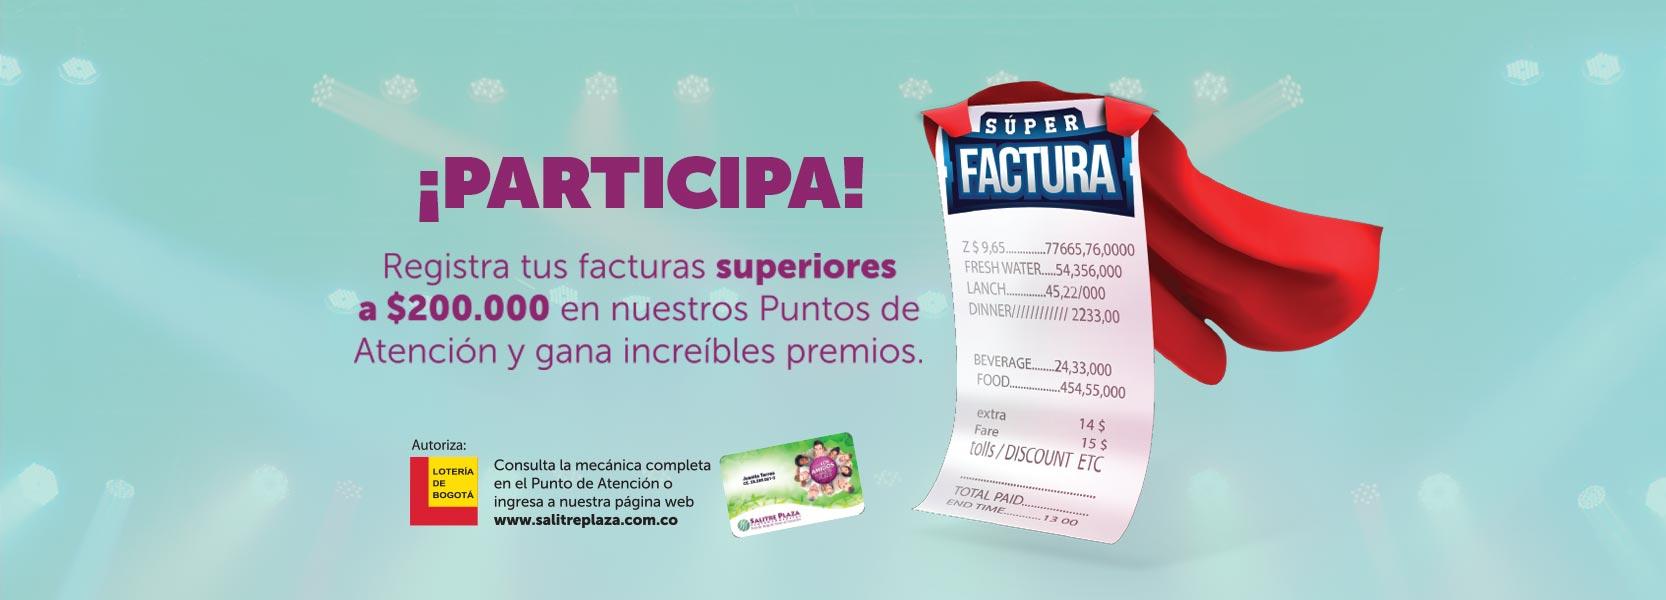 Vitrina-Factura